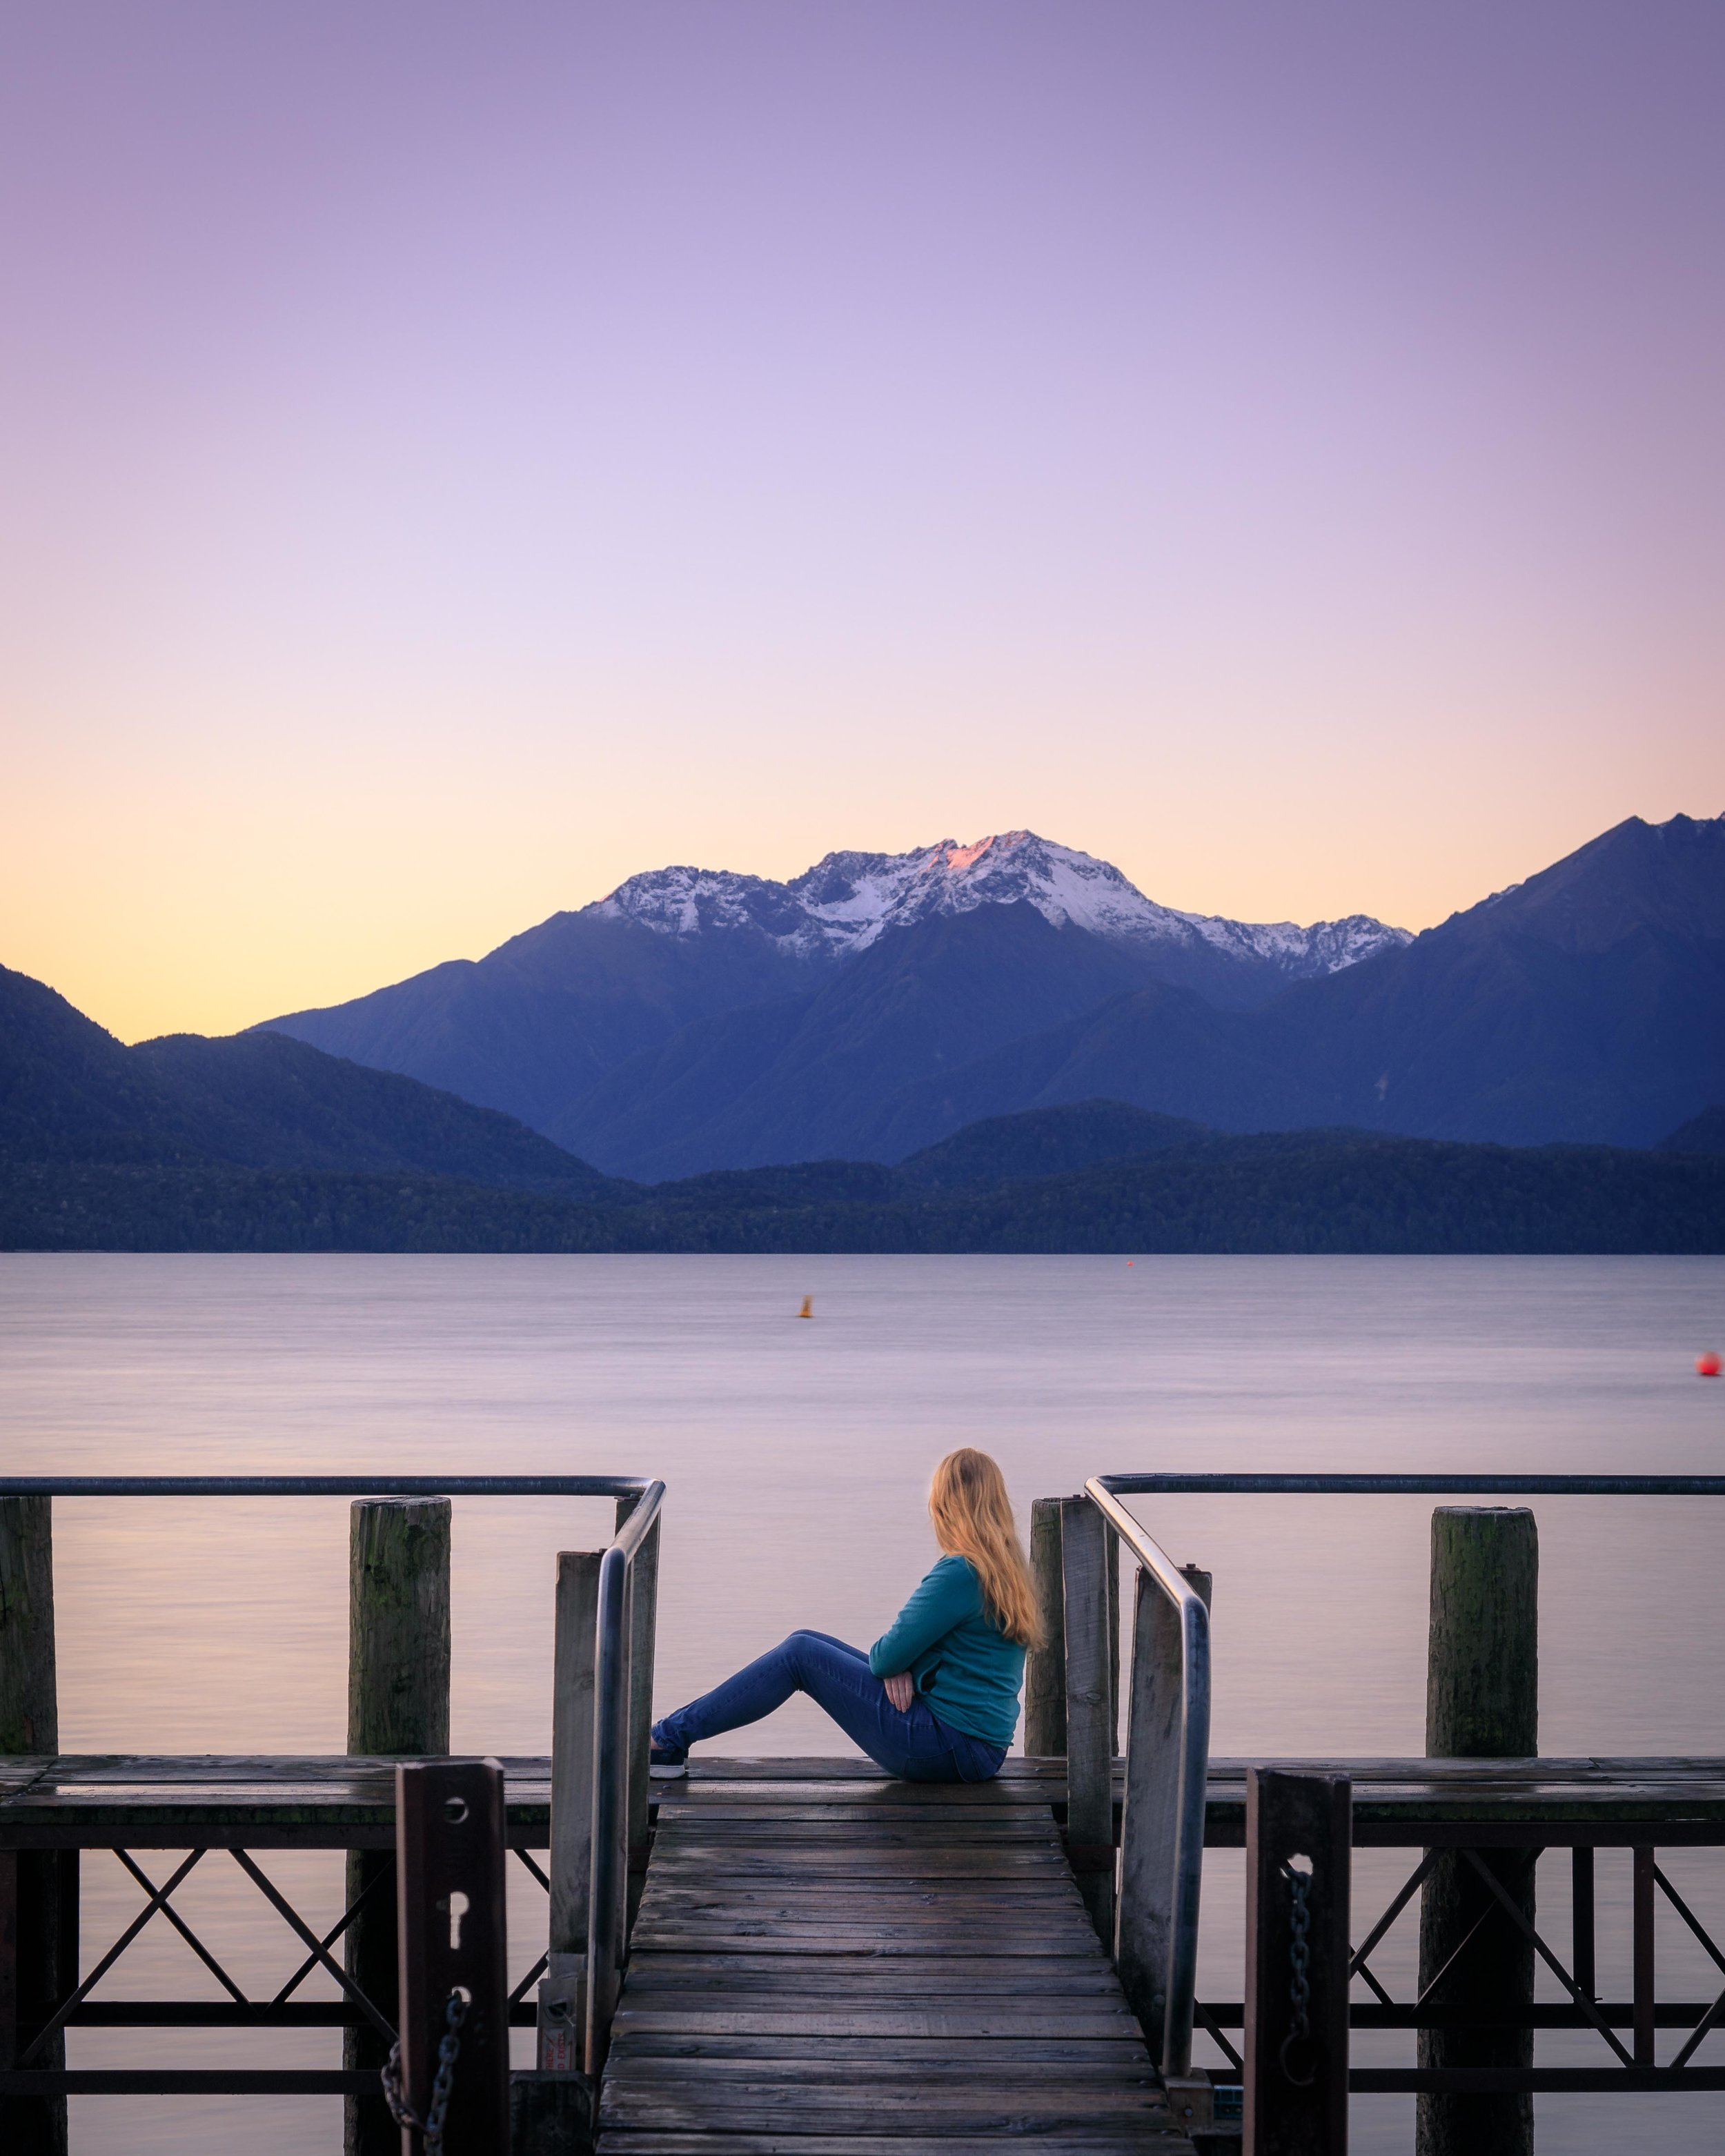 Instagrammable spots of New Zealand: Te Anau Jetty